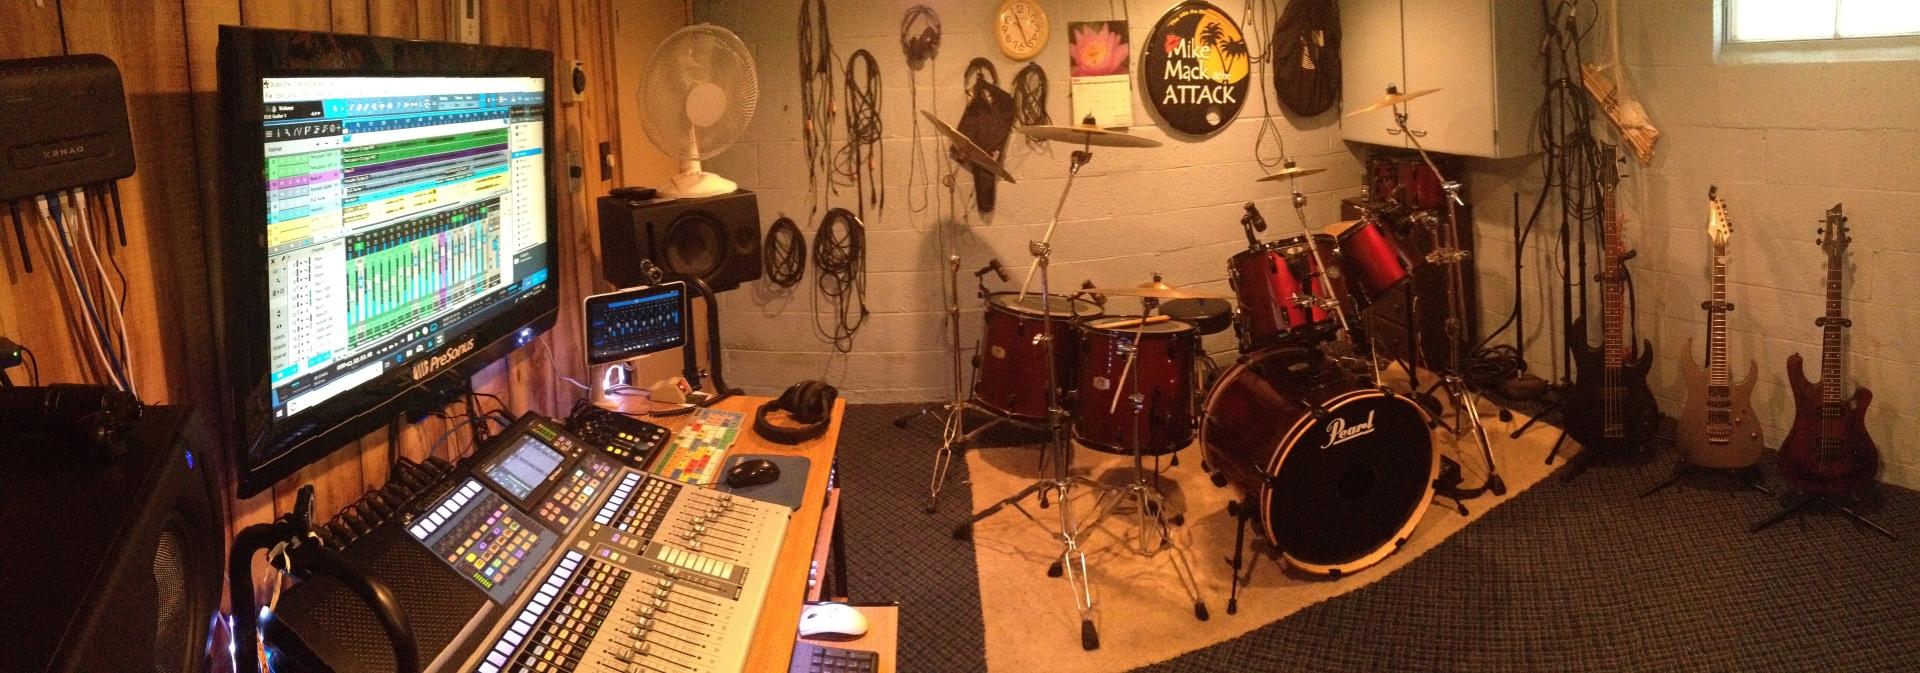 Dusty Attic Studio Control Room